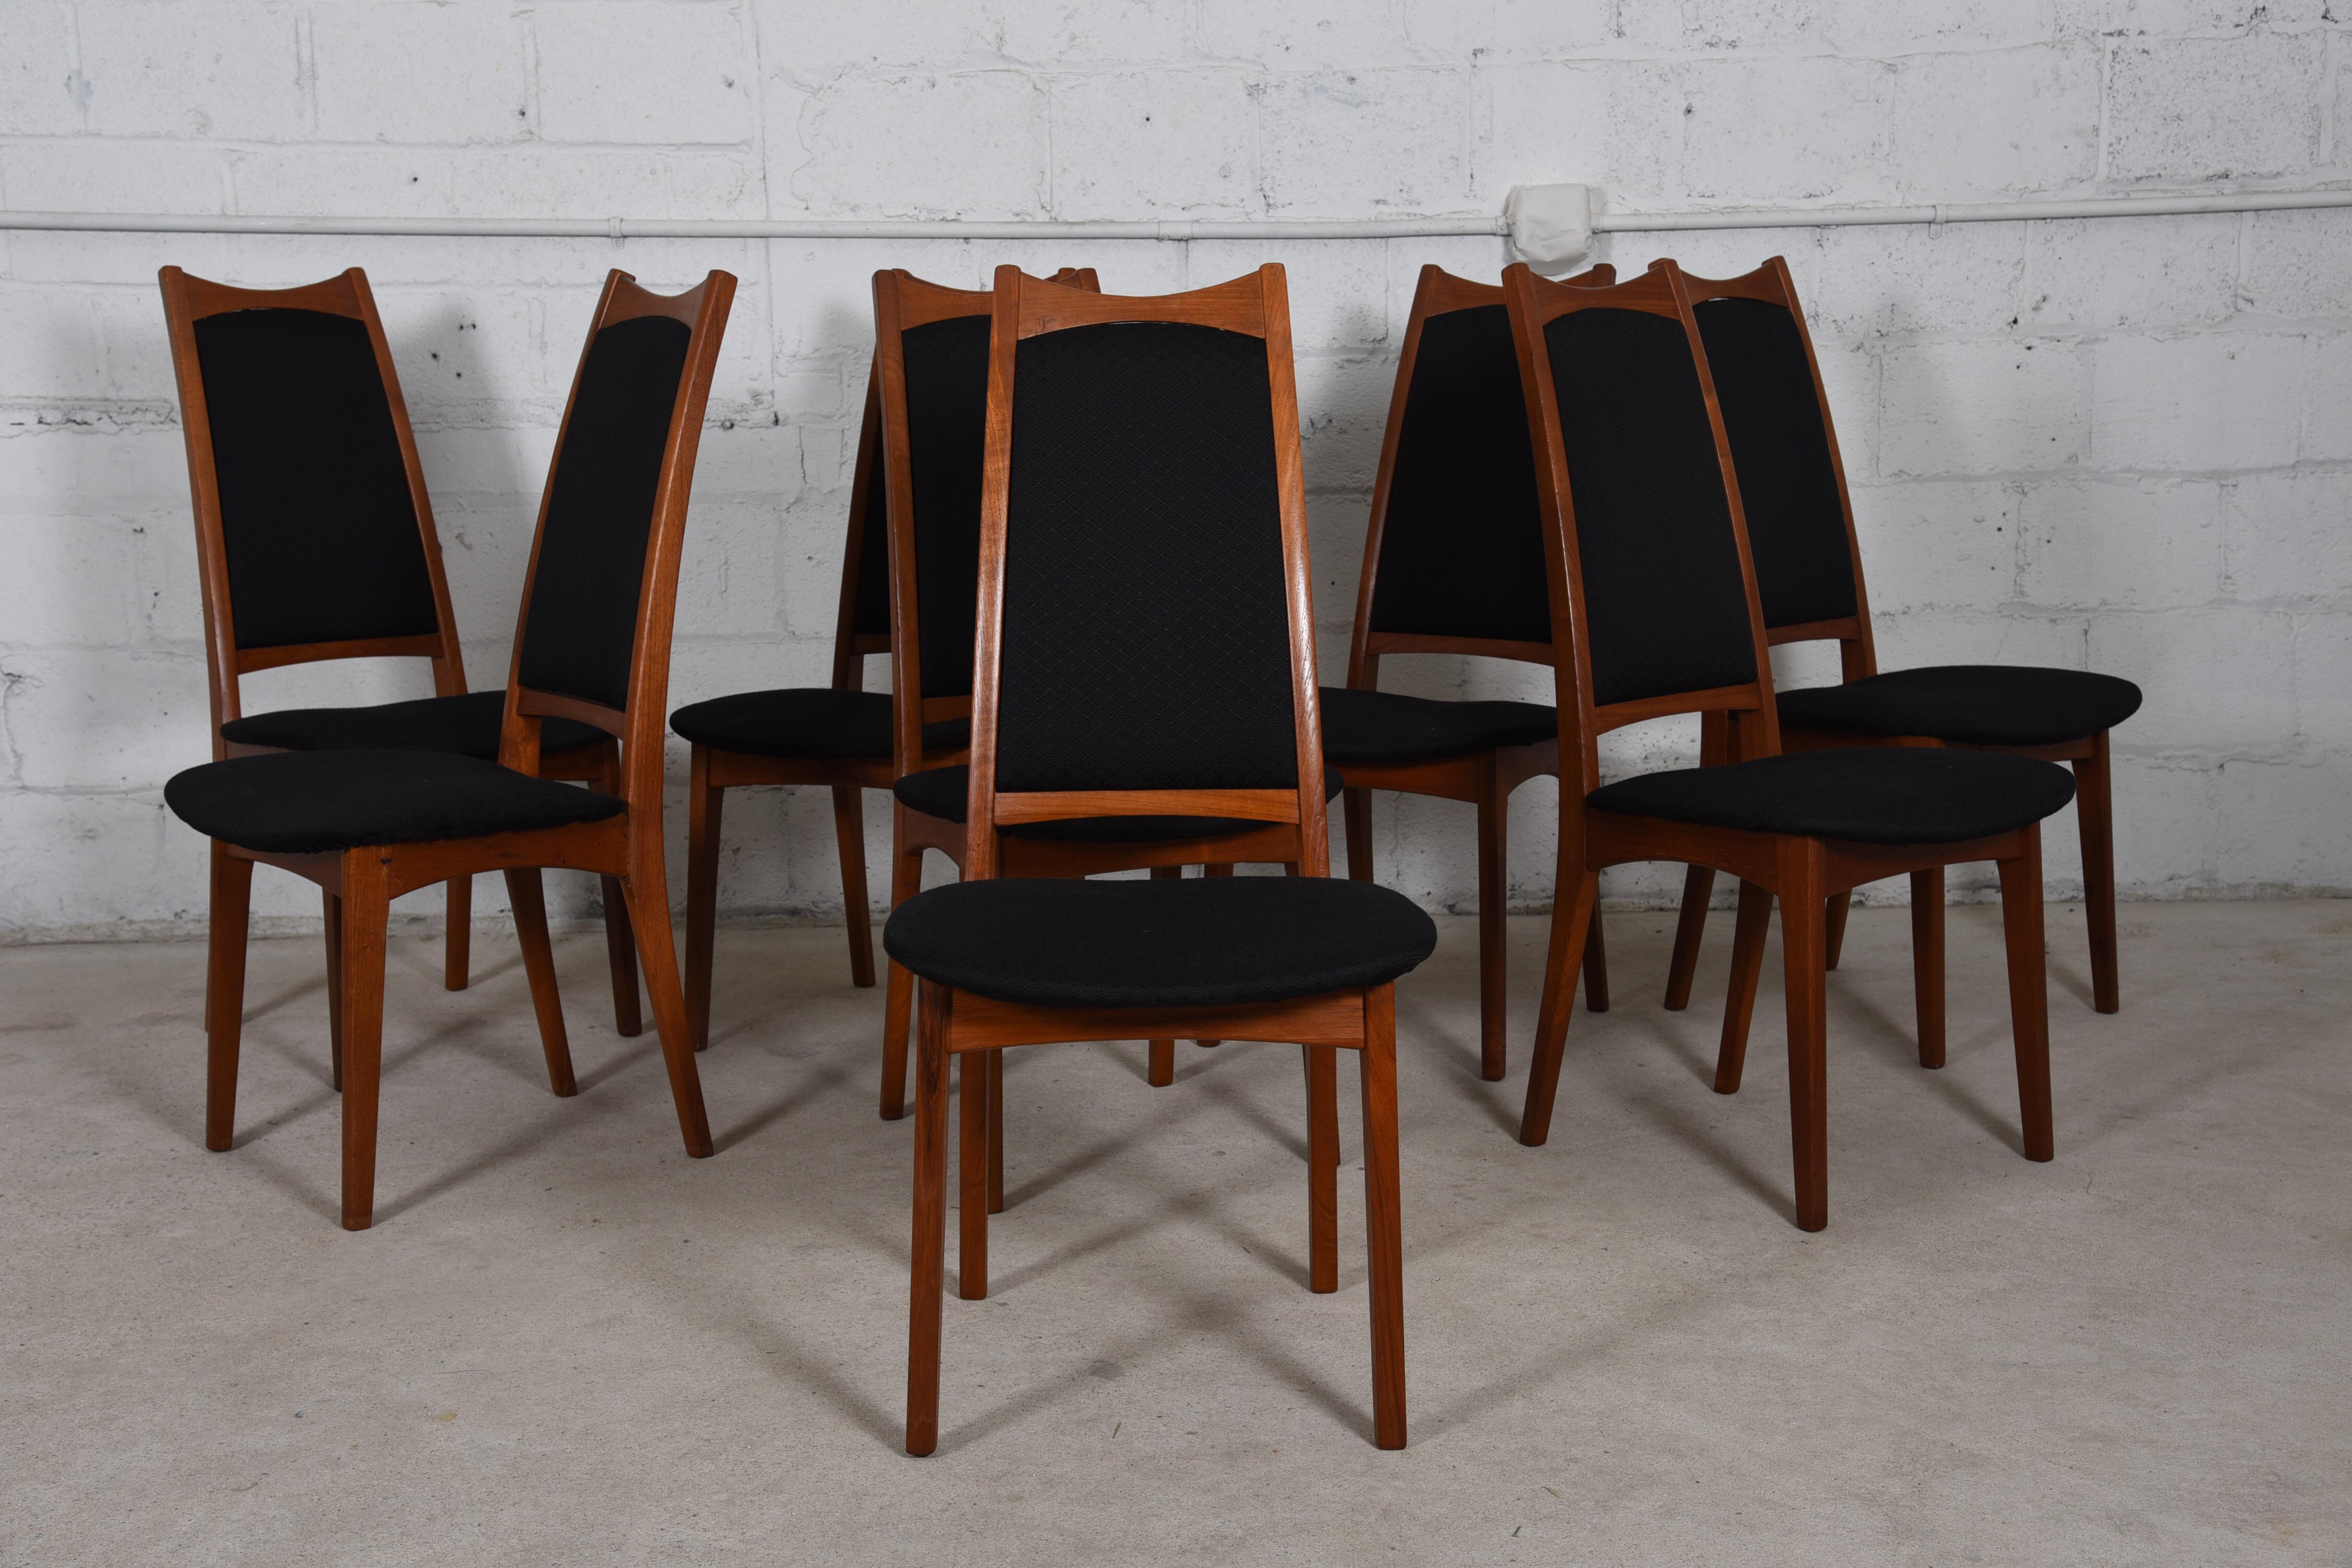 Moreddi Danish Teak Tall Back Dining Chairs W/ Black Upholstery   Set Of 8